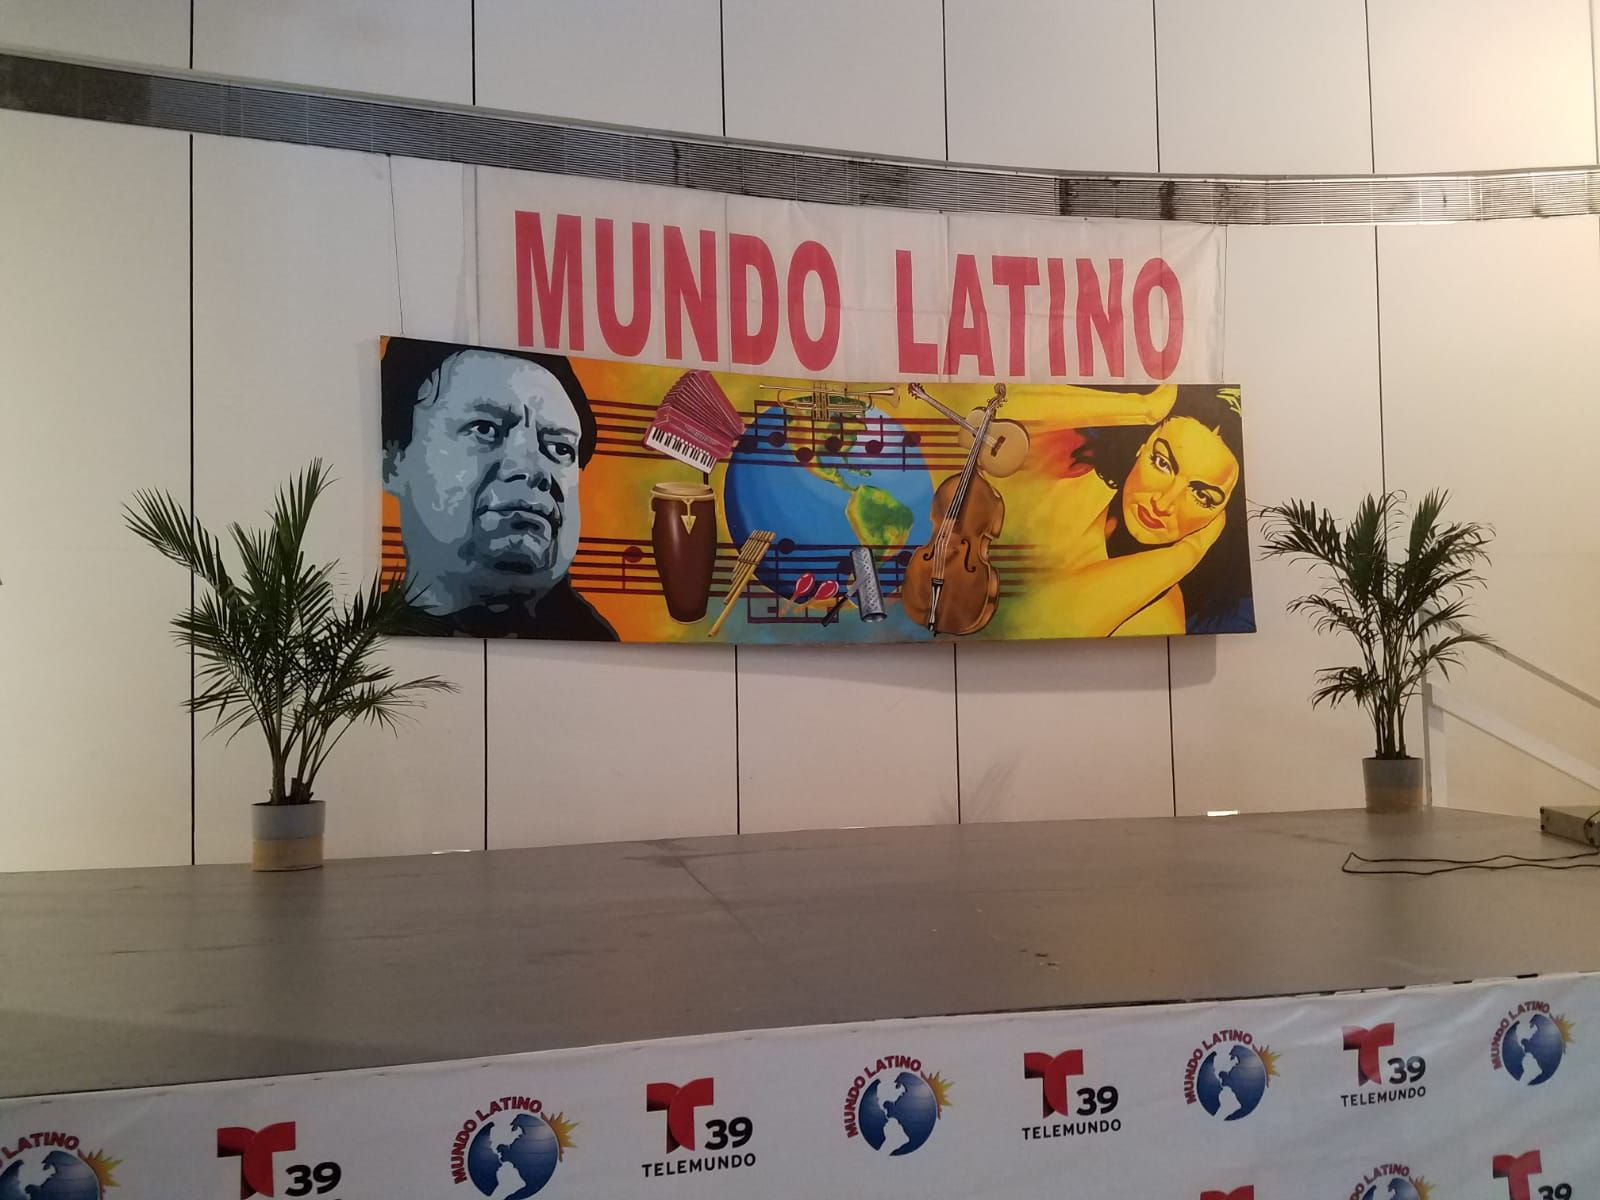 Mundo Latino. Foto de Lourdes Vázquez para Al Día.